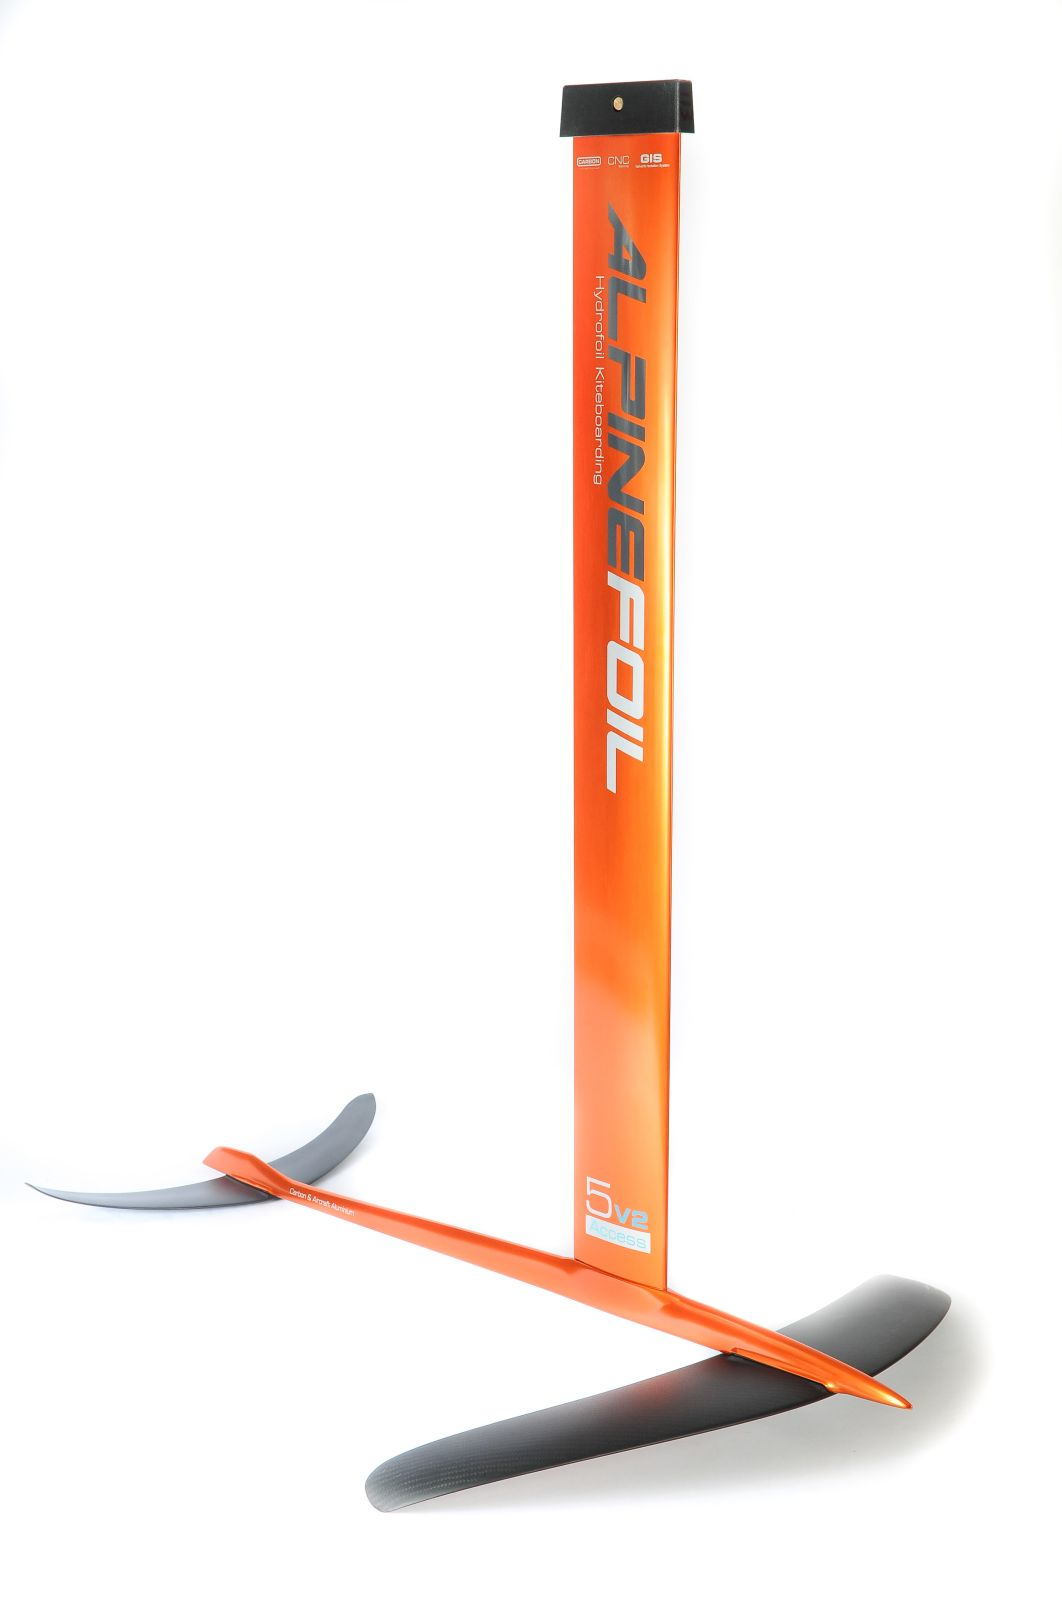 Kitefoil carbon aluminium alpinefoil 5 0 access v2 2752 1